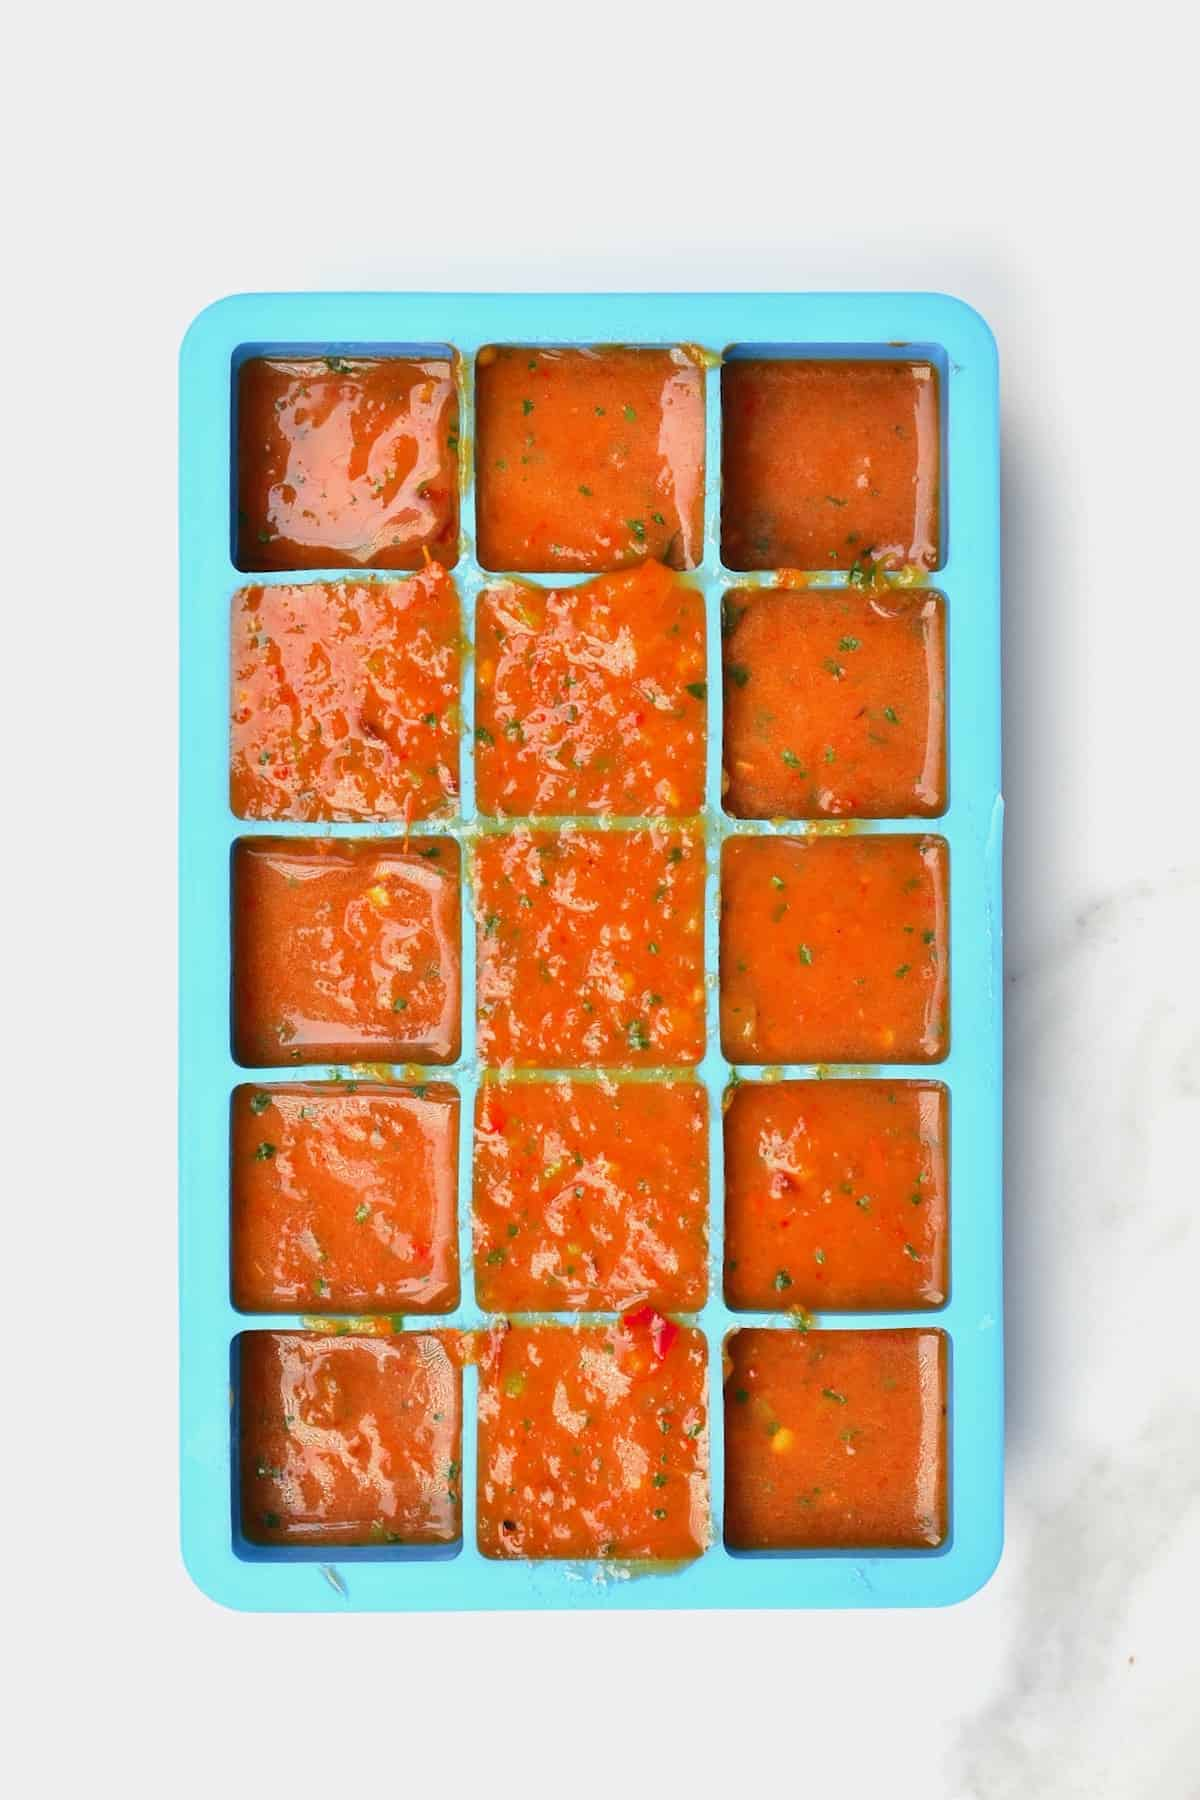 Salsa roja in ice cube tray